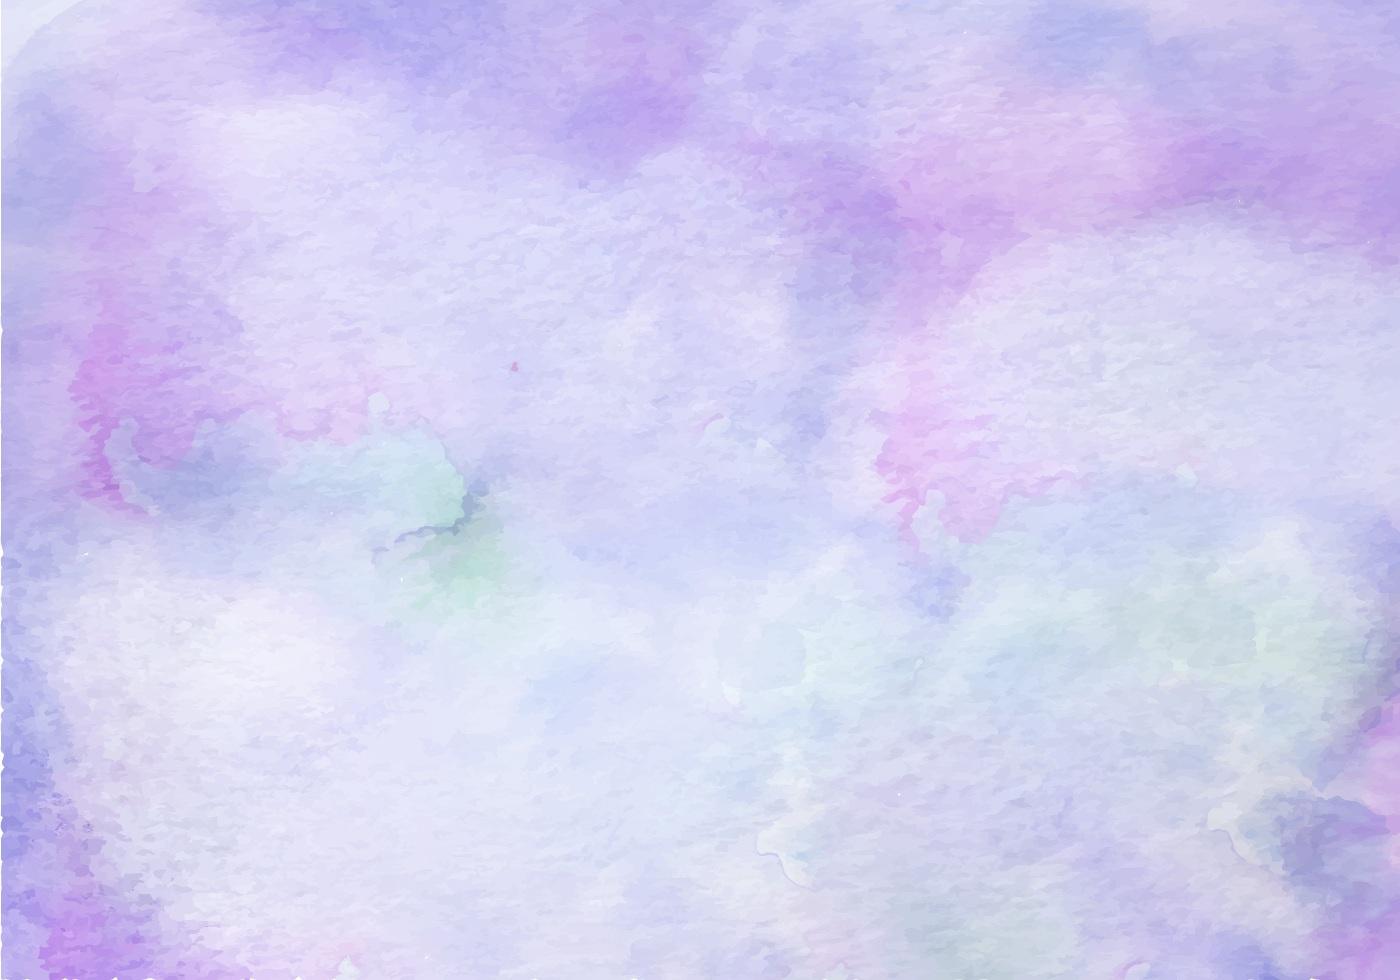 Purple Free Vector Watercolor Texture Download Free